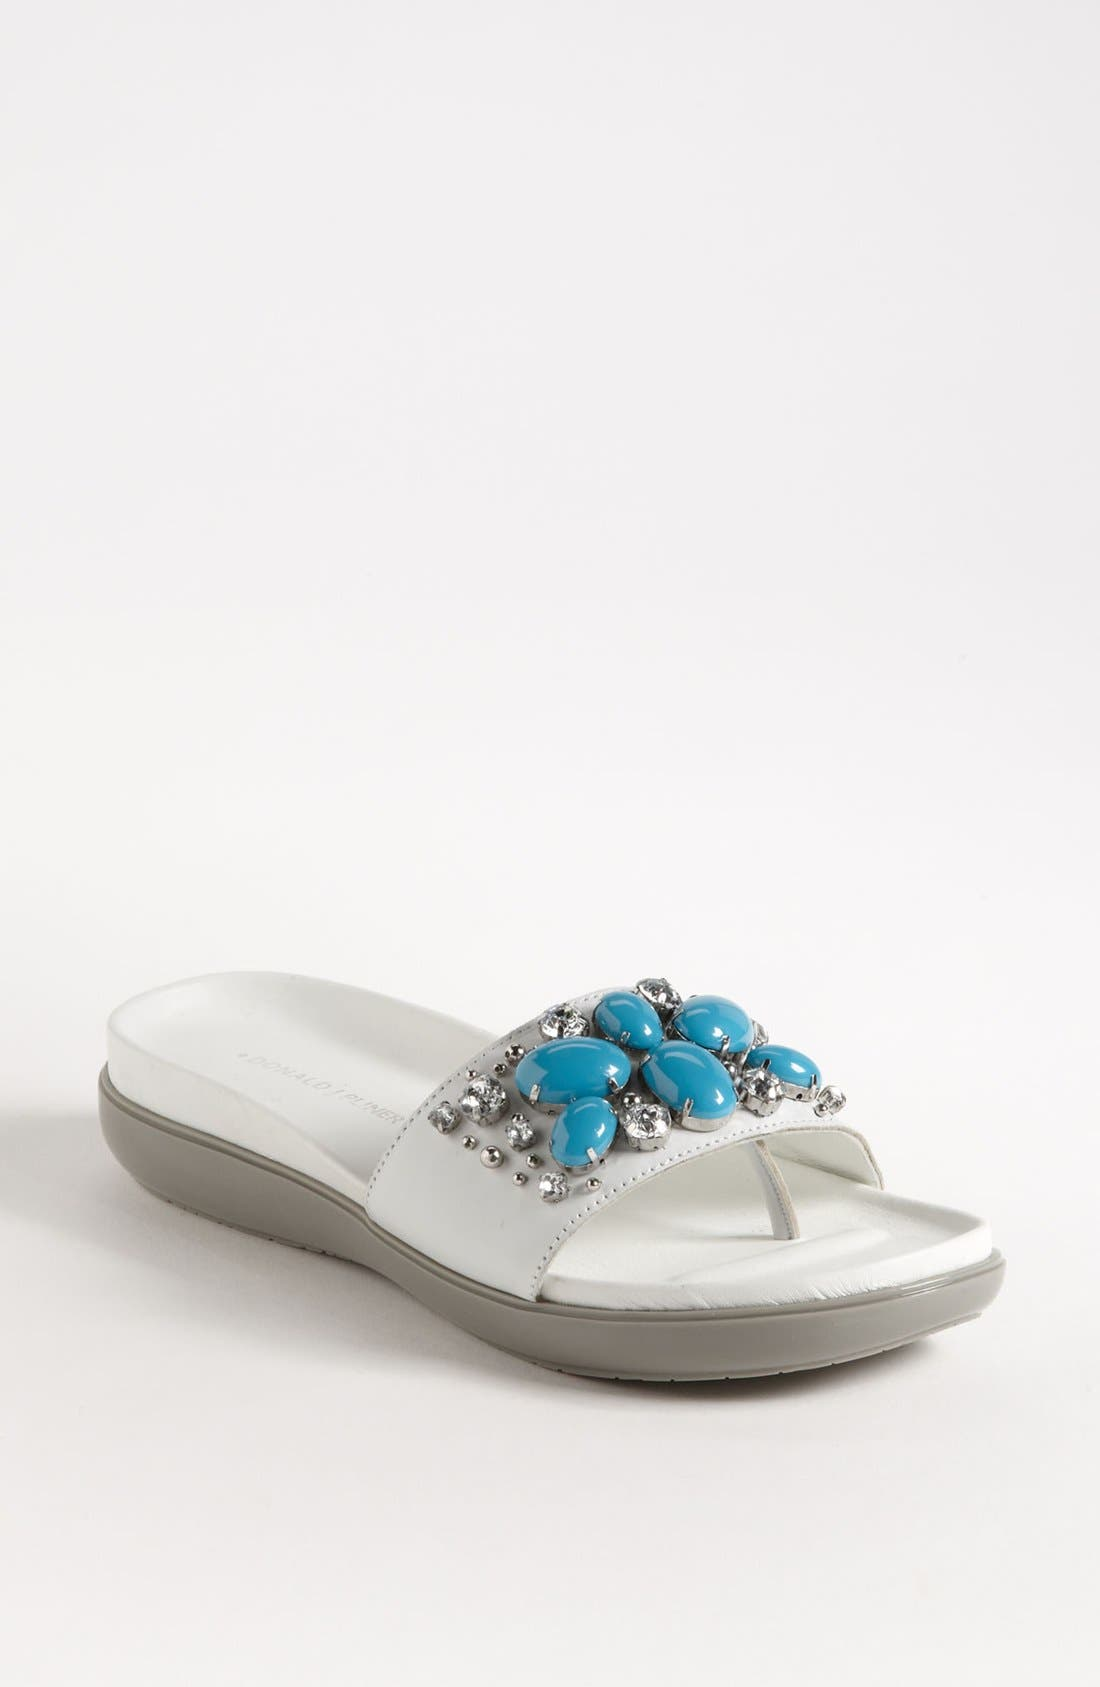 Alternate Image 1 Selected - Donald J Pliner 'Holly' Sandal